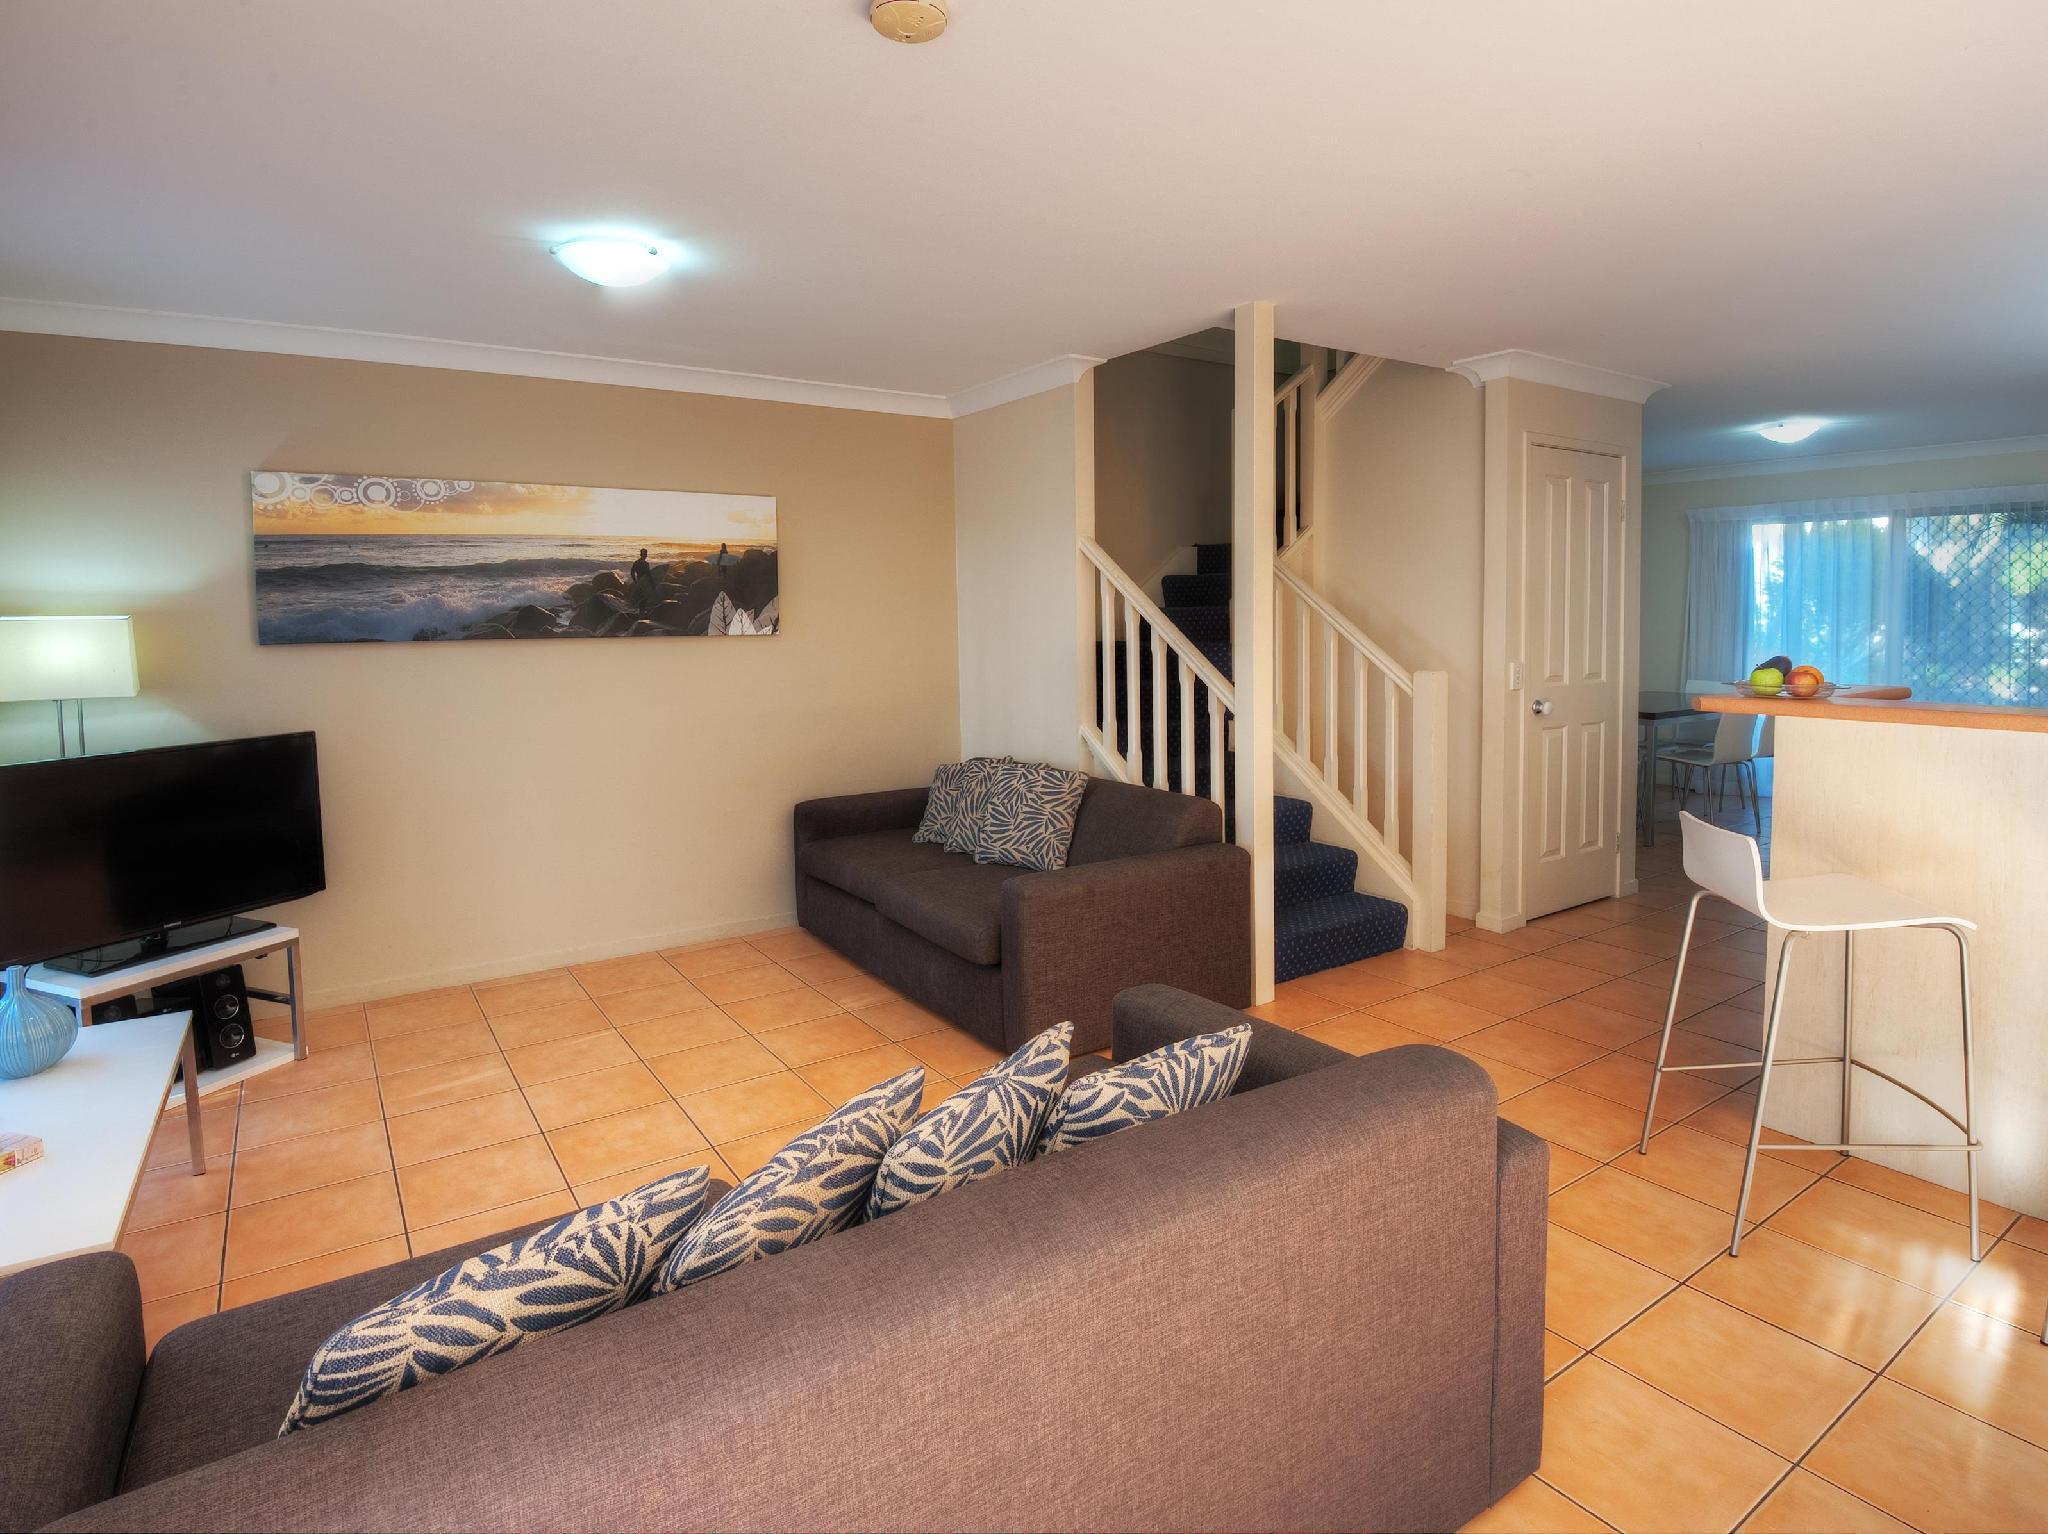 Turtle Beach Resort, Mermaid Beach, Gold Coast - TripAdvisor